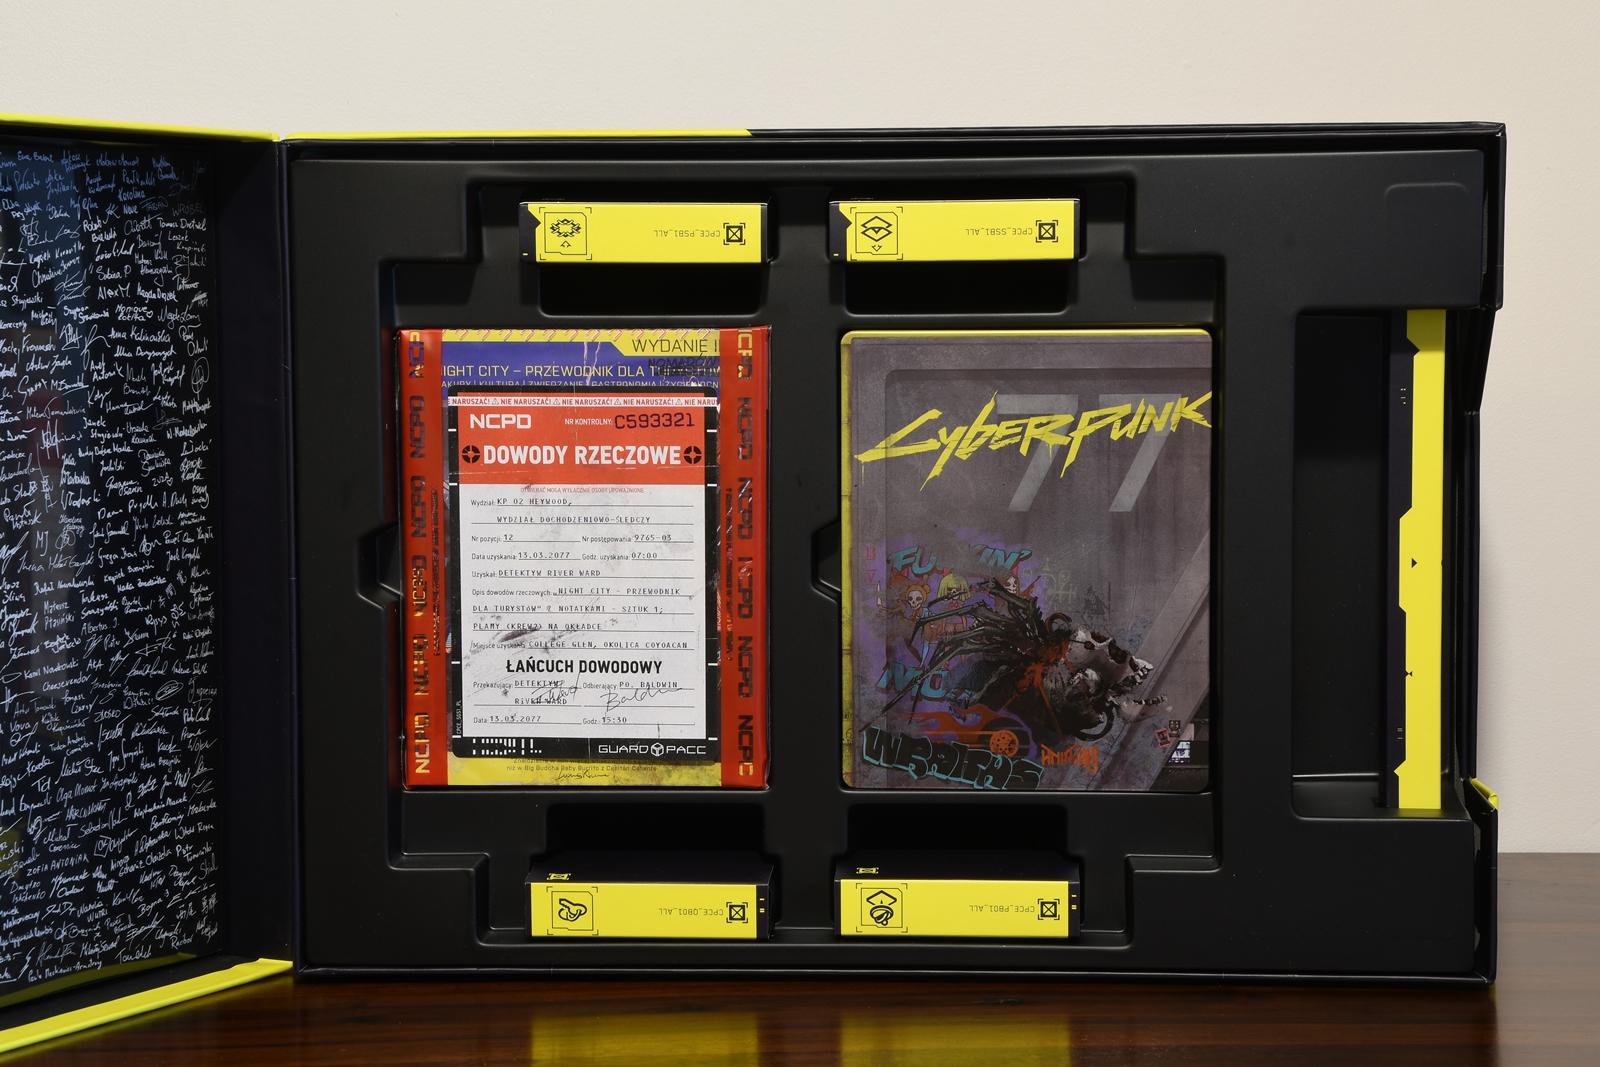 edycja kolekcjonerska cyberpunk 2077